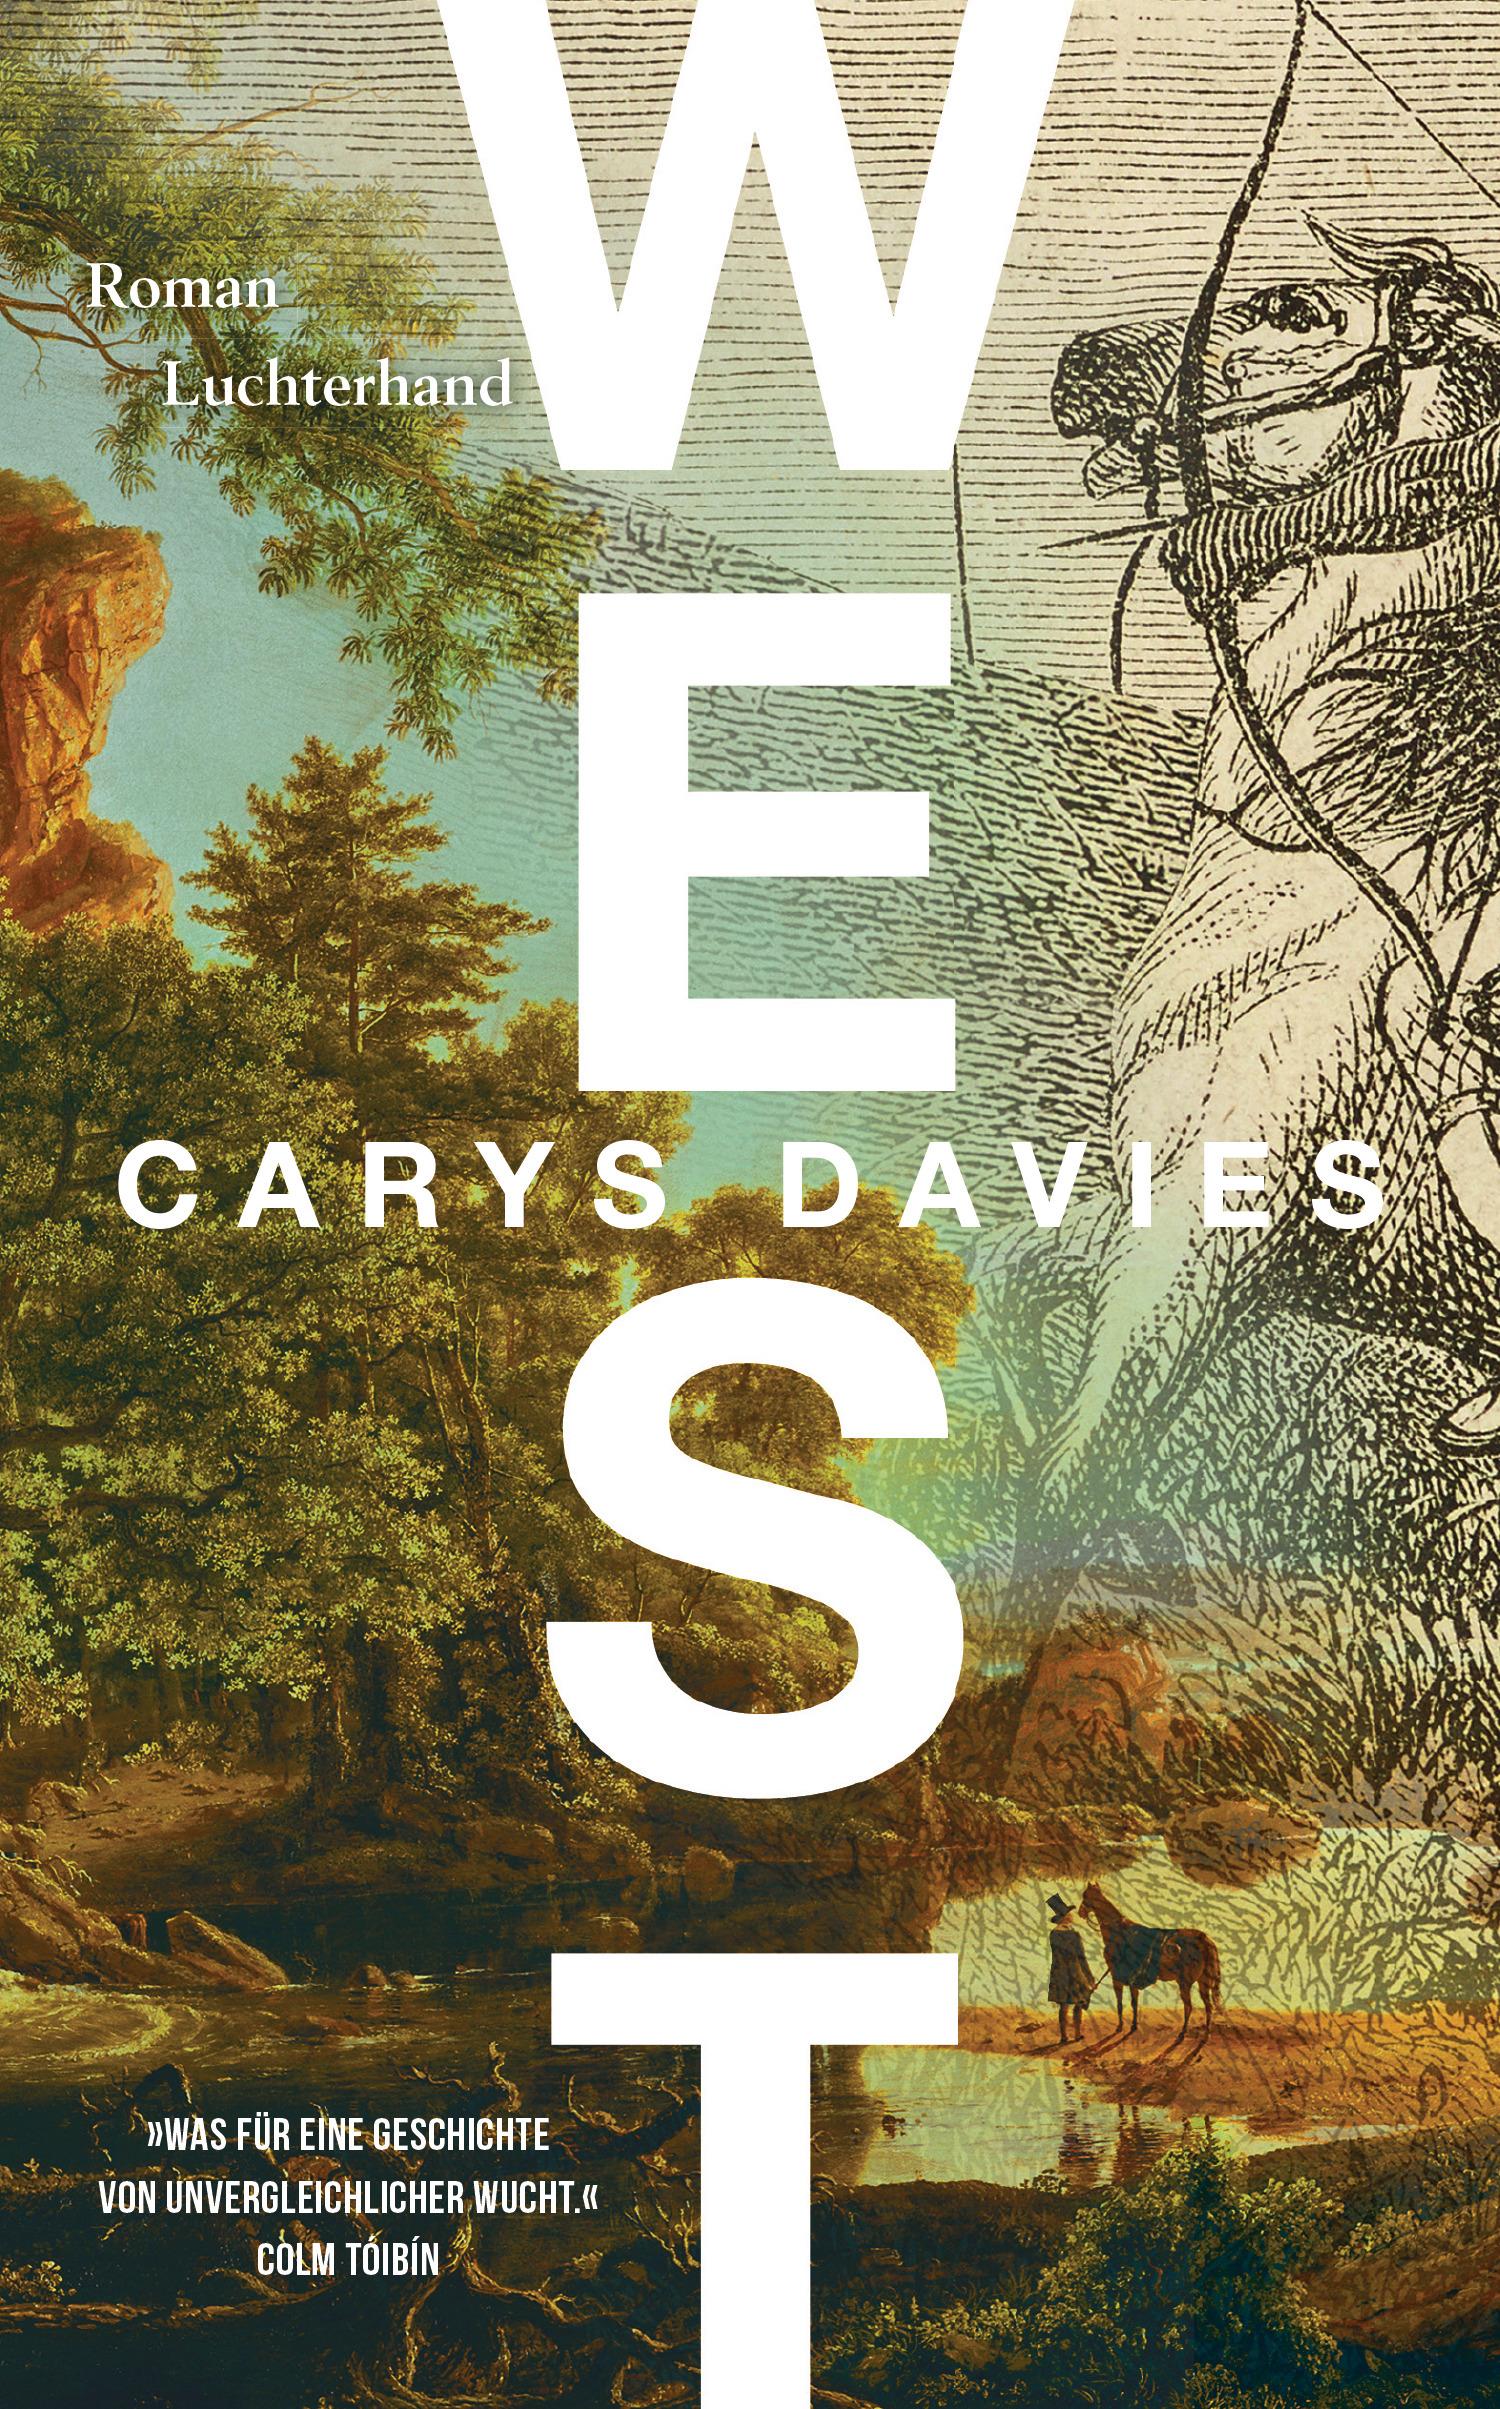 West von Carys Davies Parkbuchhandlung Buchhandlung Bonn Bad Godesberg